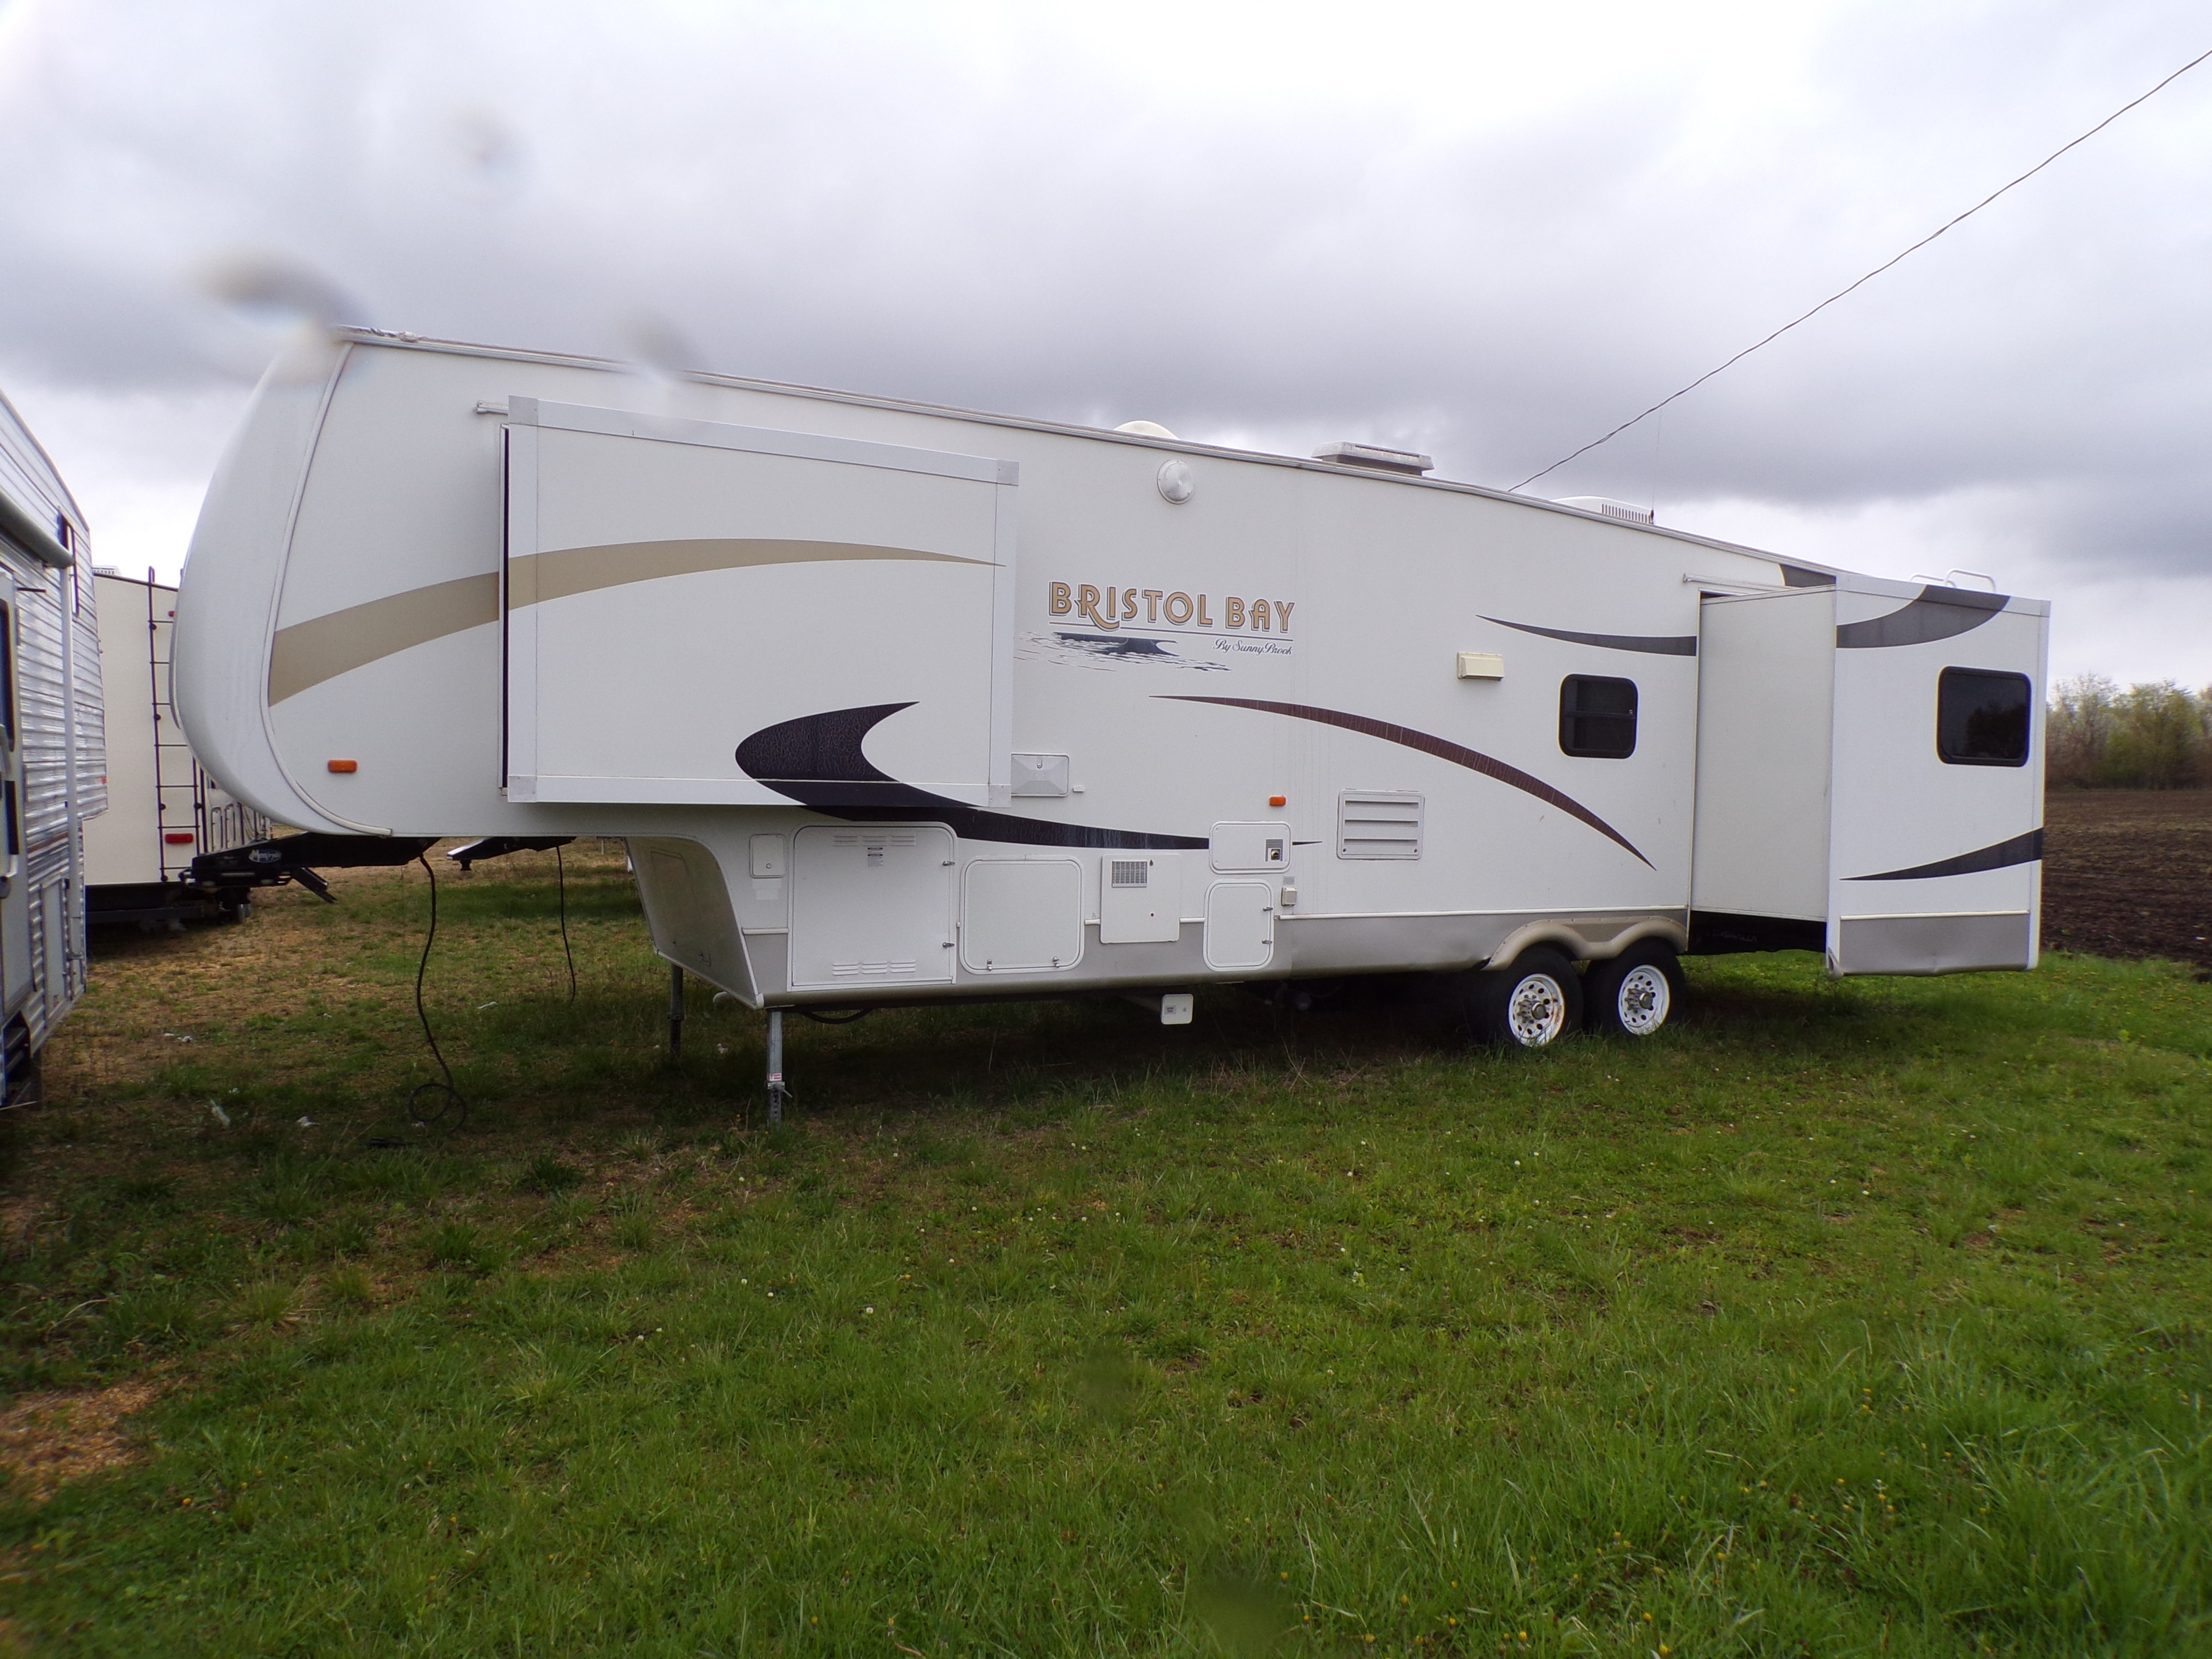 Used, 2007, Sunnybrook, Bristol Bay 3450TS, Fifth Wheels